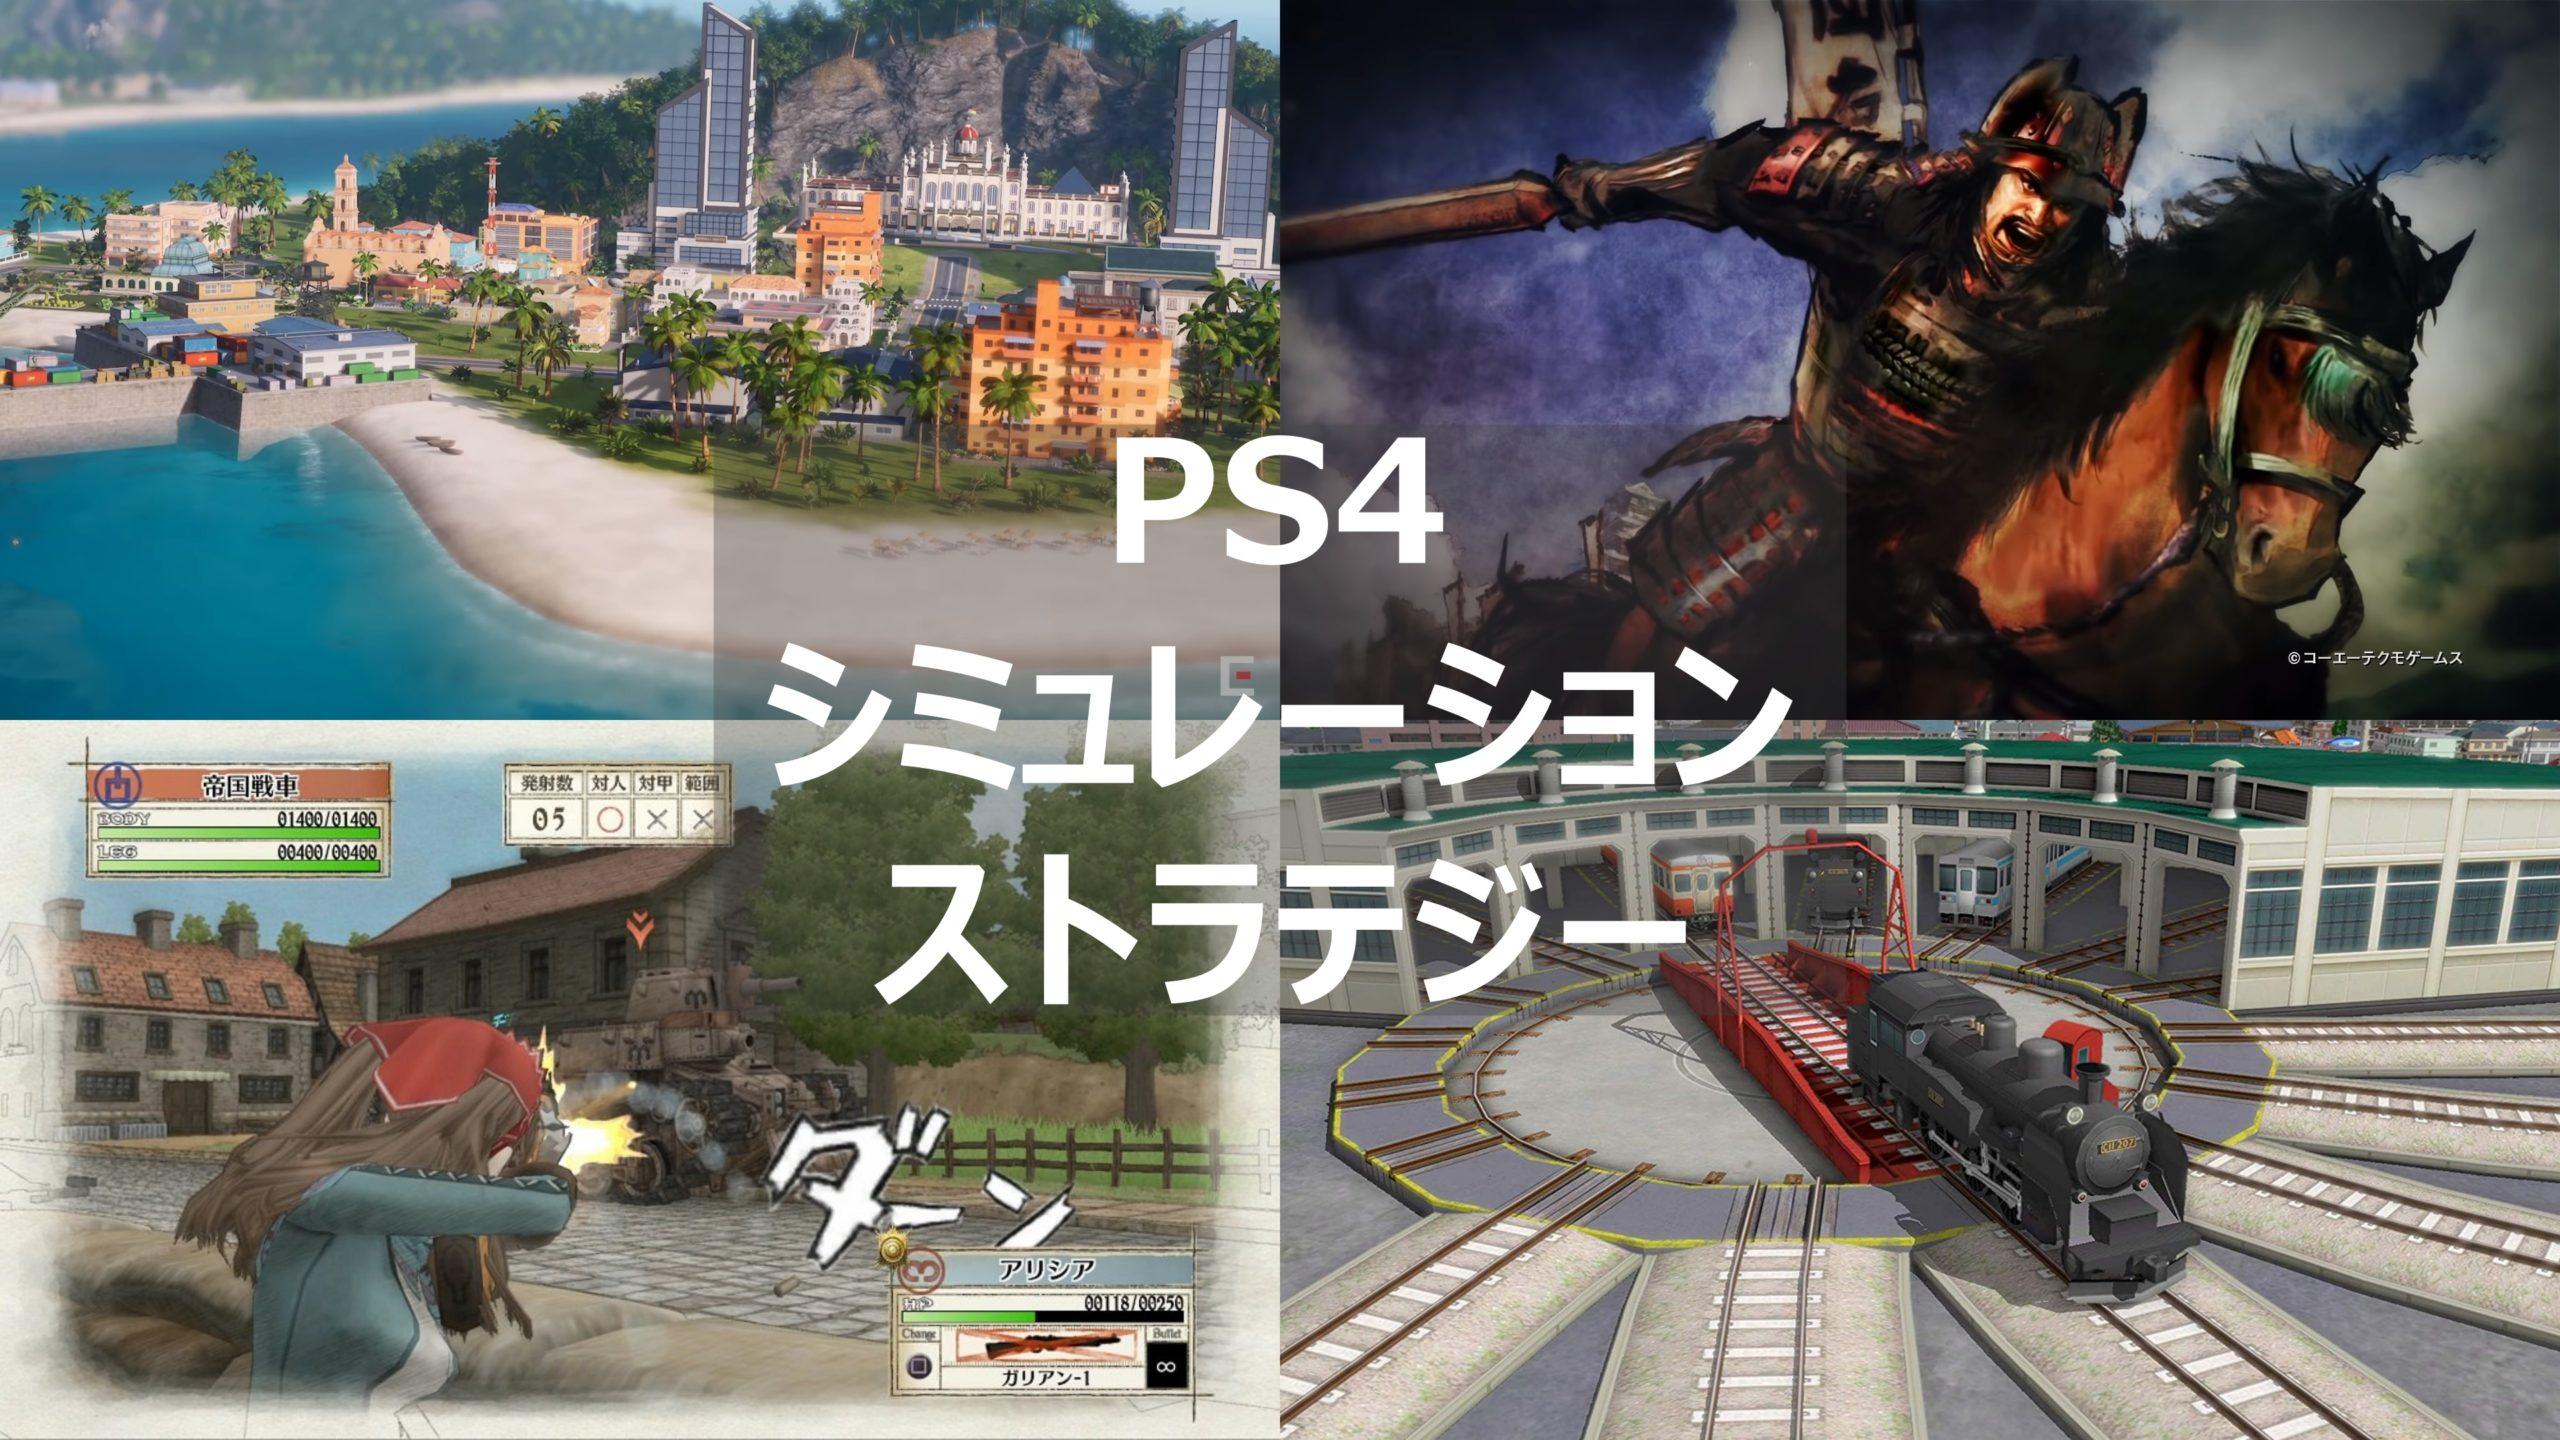 PS4 シミュレーション ストラテジー